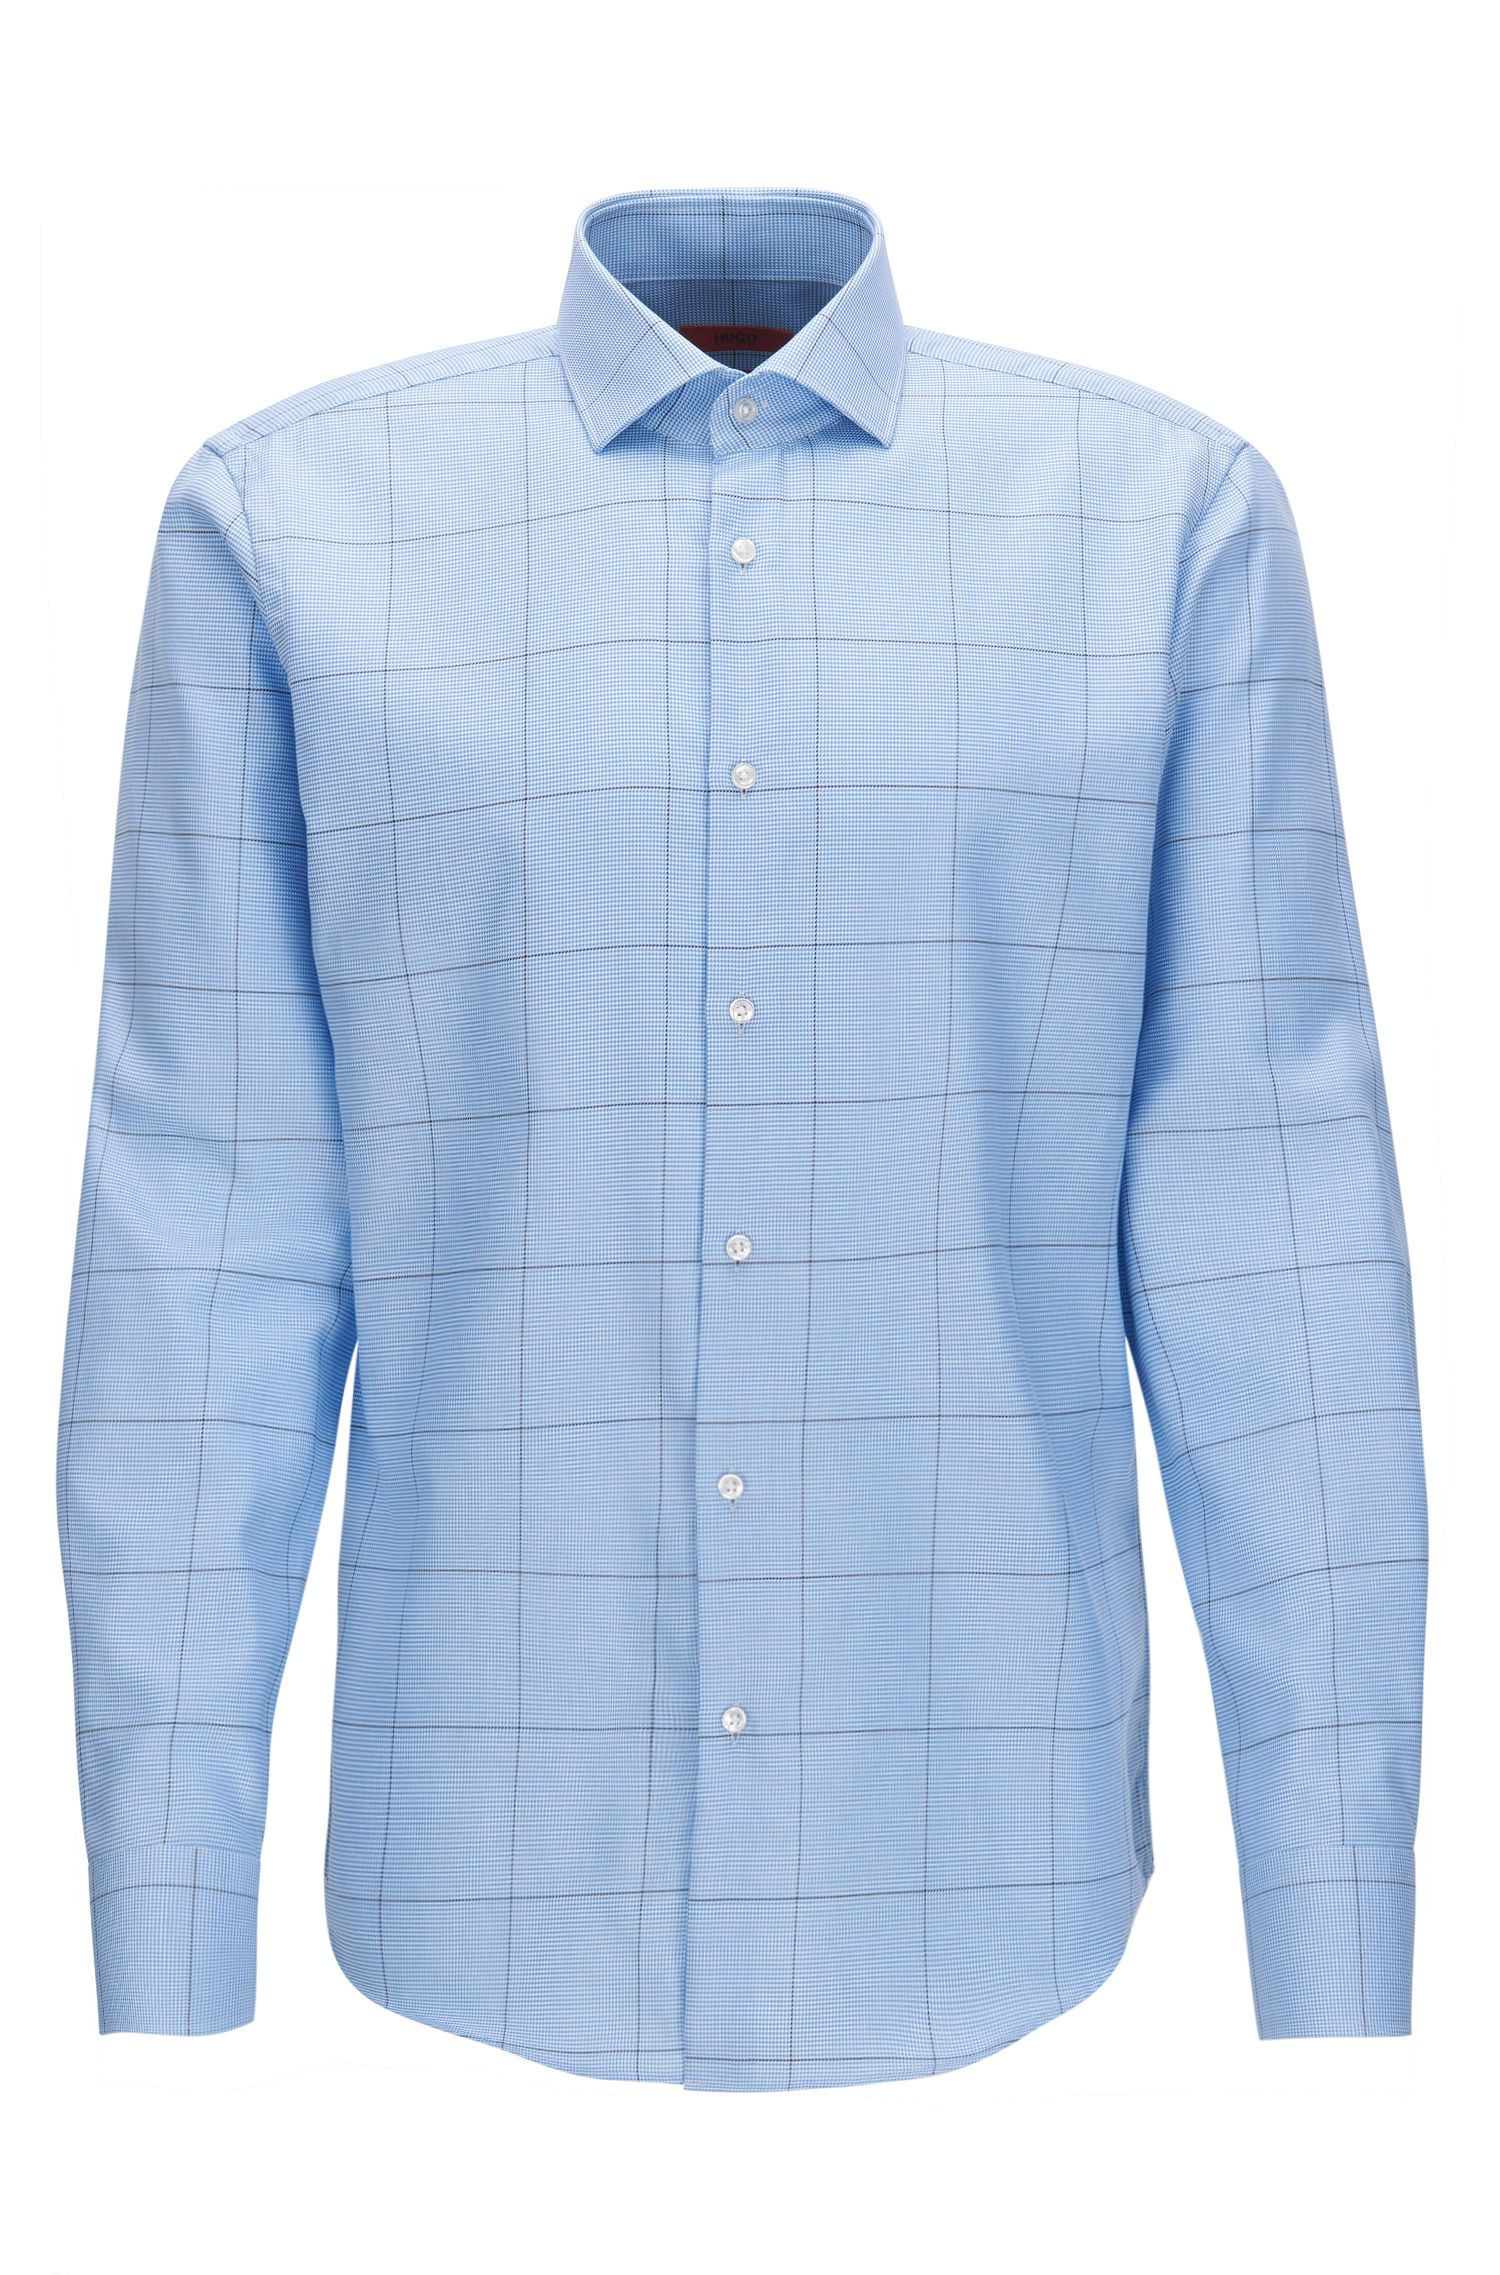 Camicia regular fit in popeline di cotone a quadri